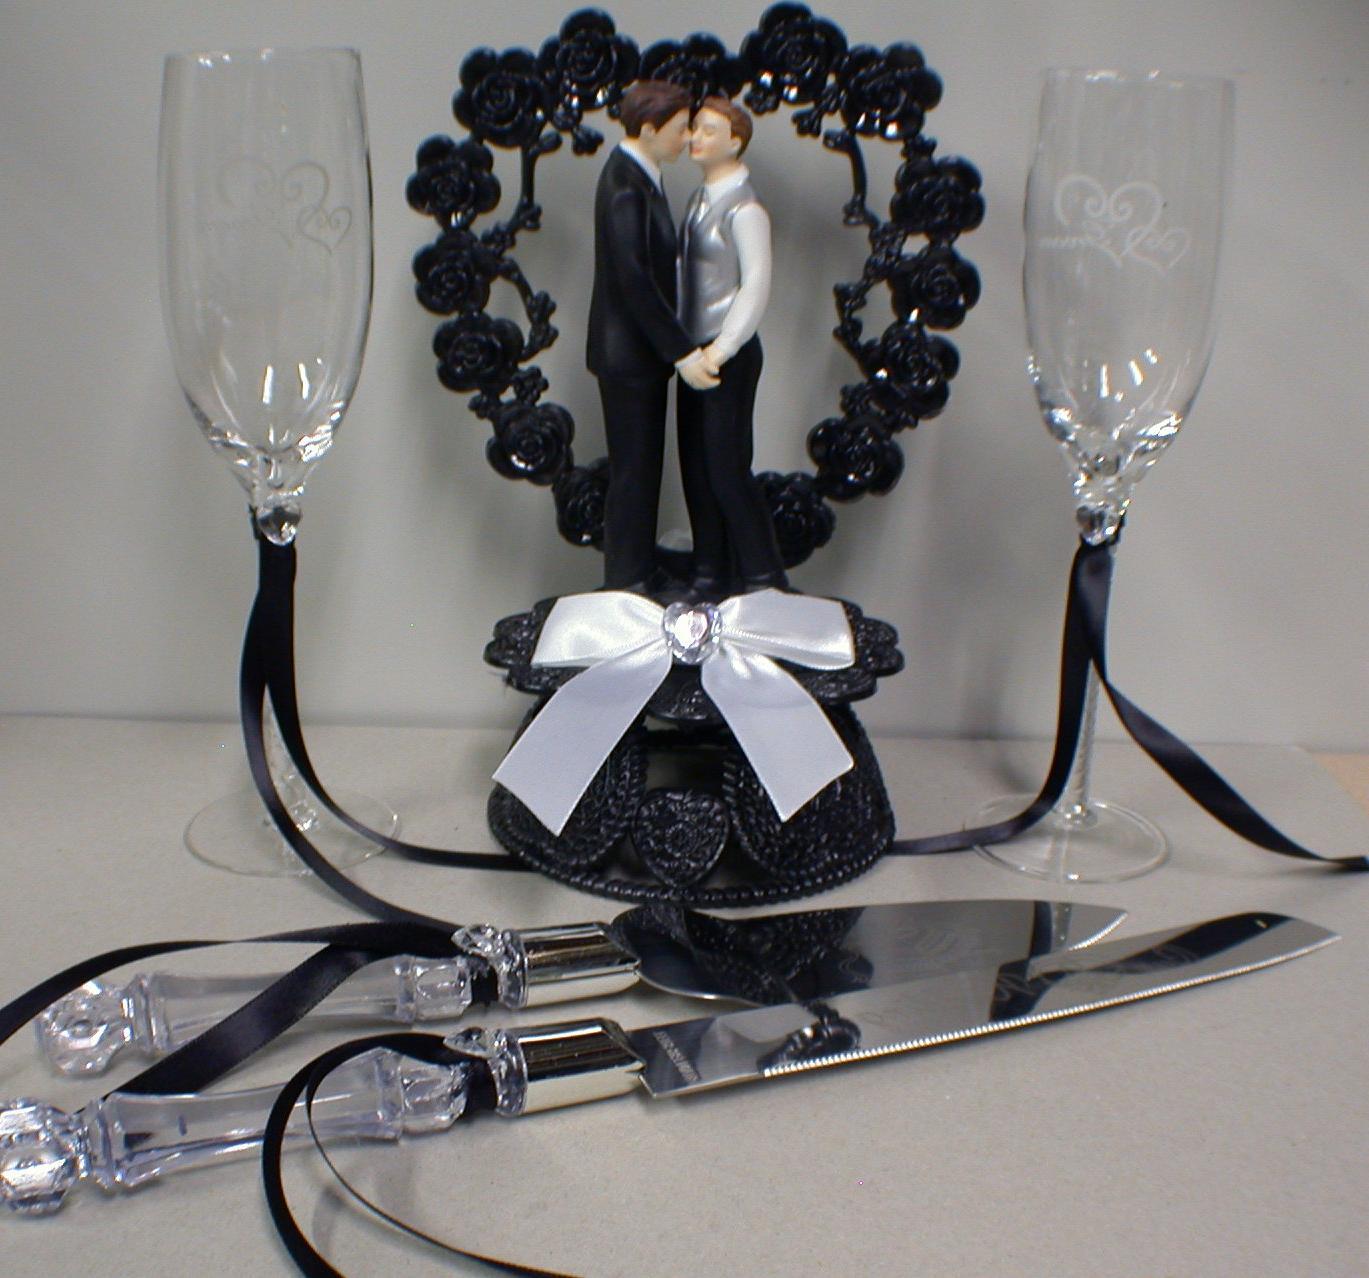 Raphaele s blog black wedding cake toppers